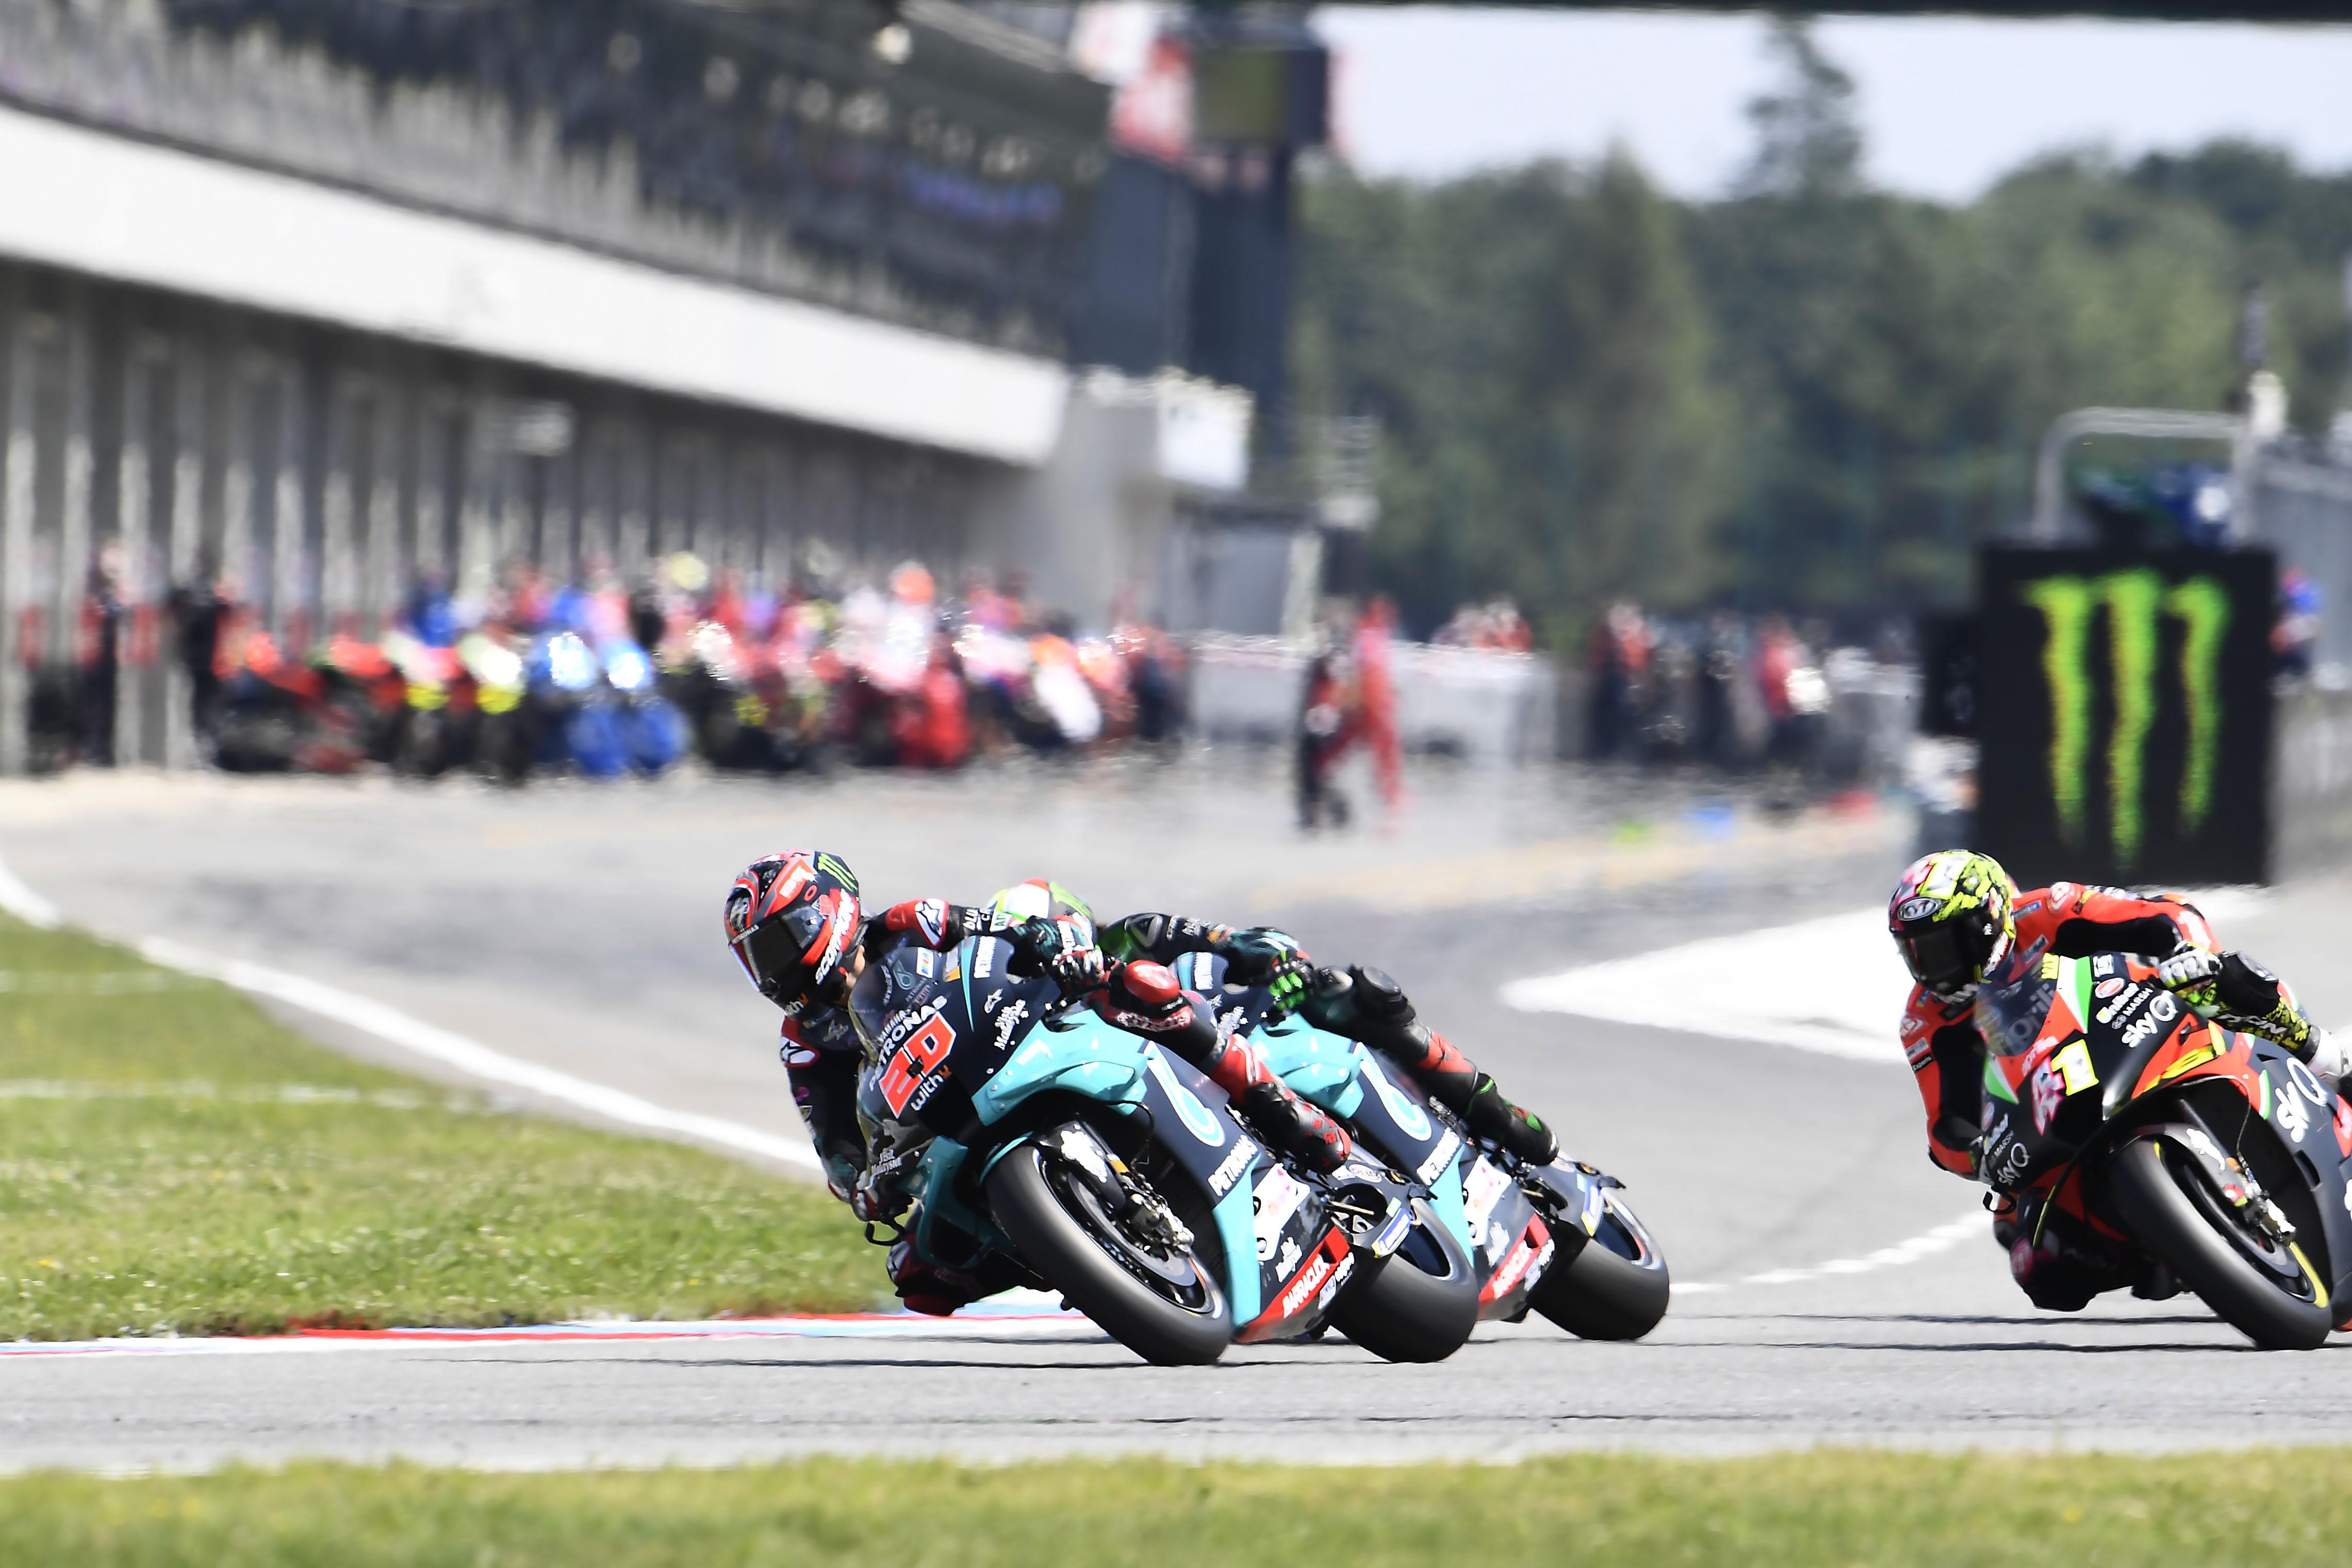 Fabio Quartararo Petronas SRT Yamaha Brno MotoGP 2020